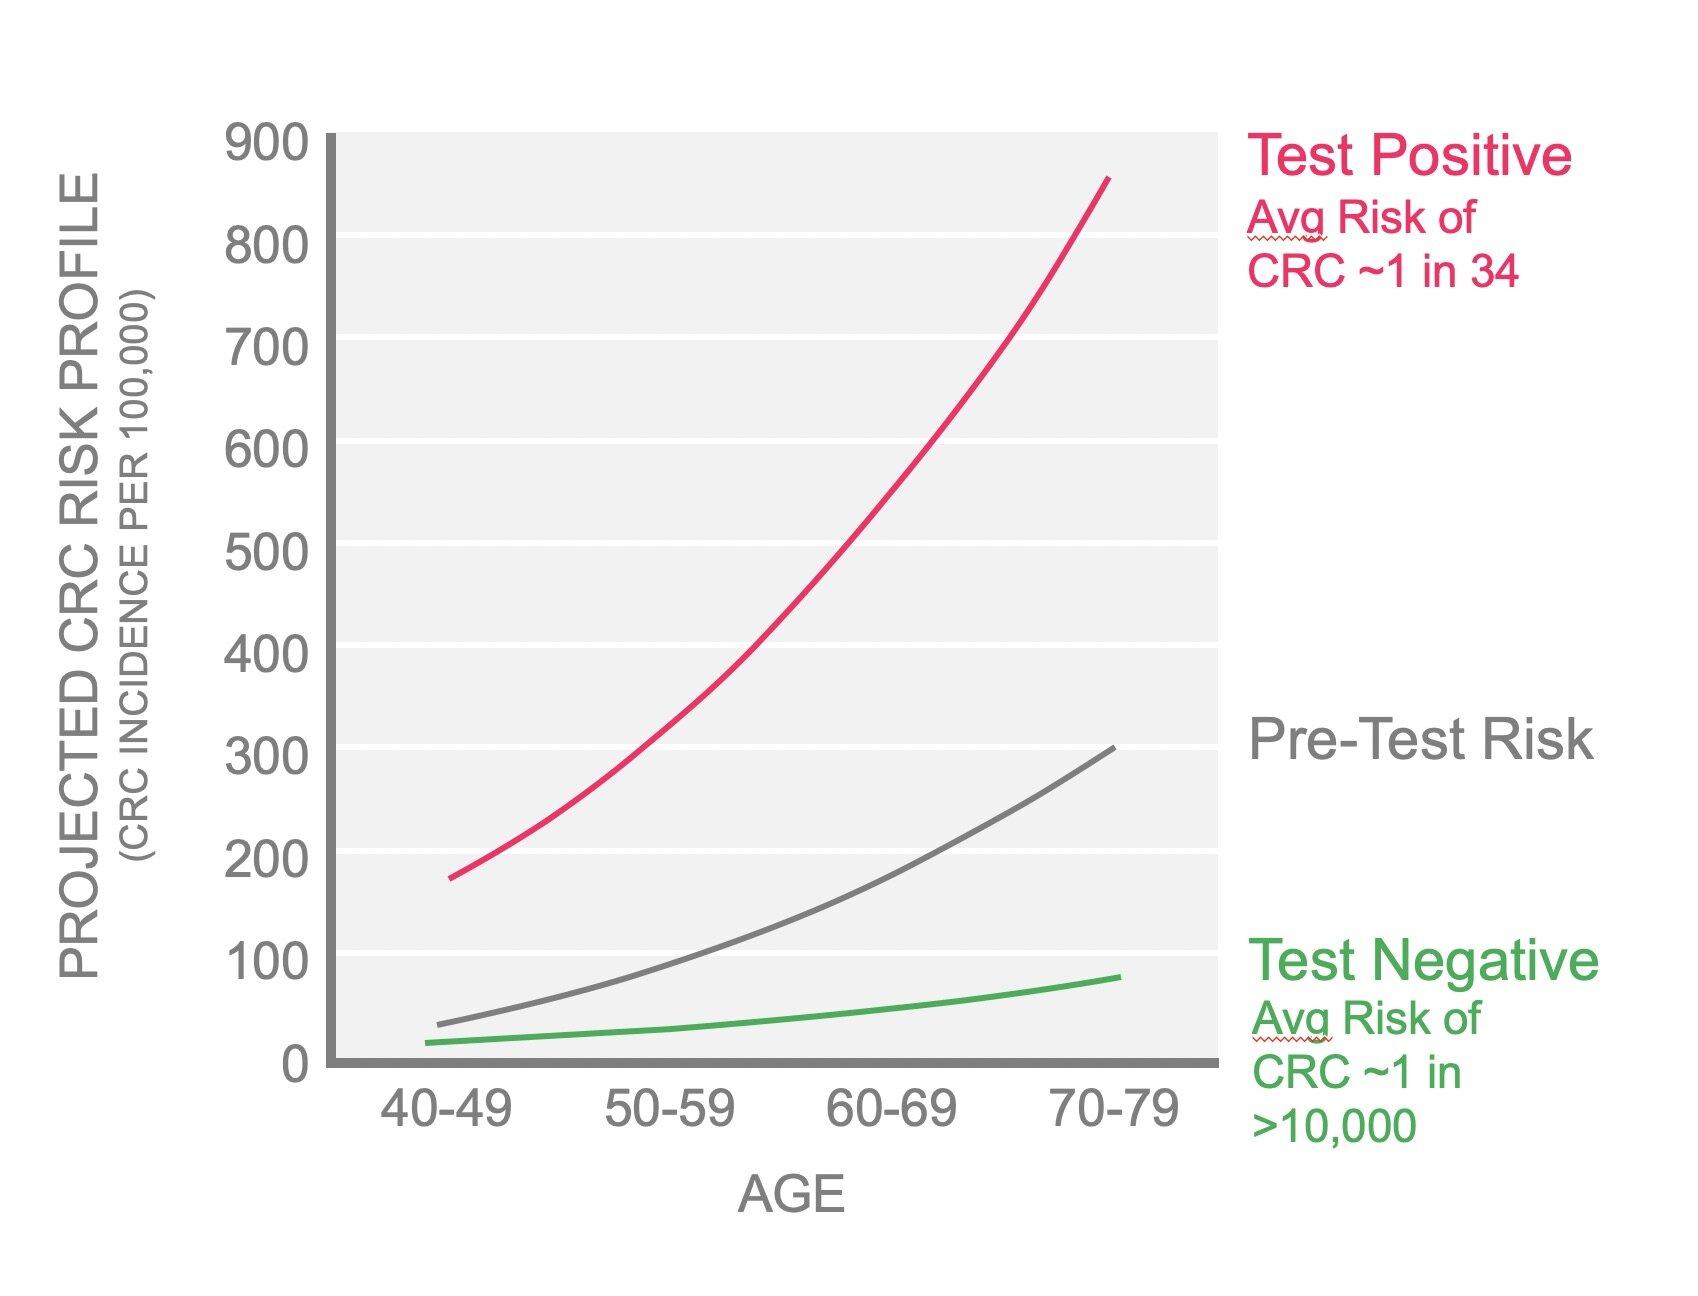 Gta 446 Test Kit Med Life Discoveries